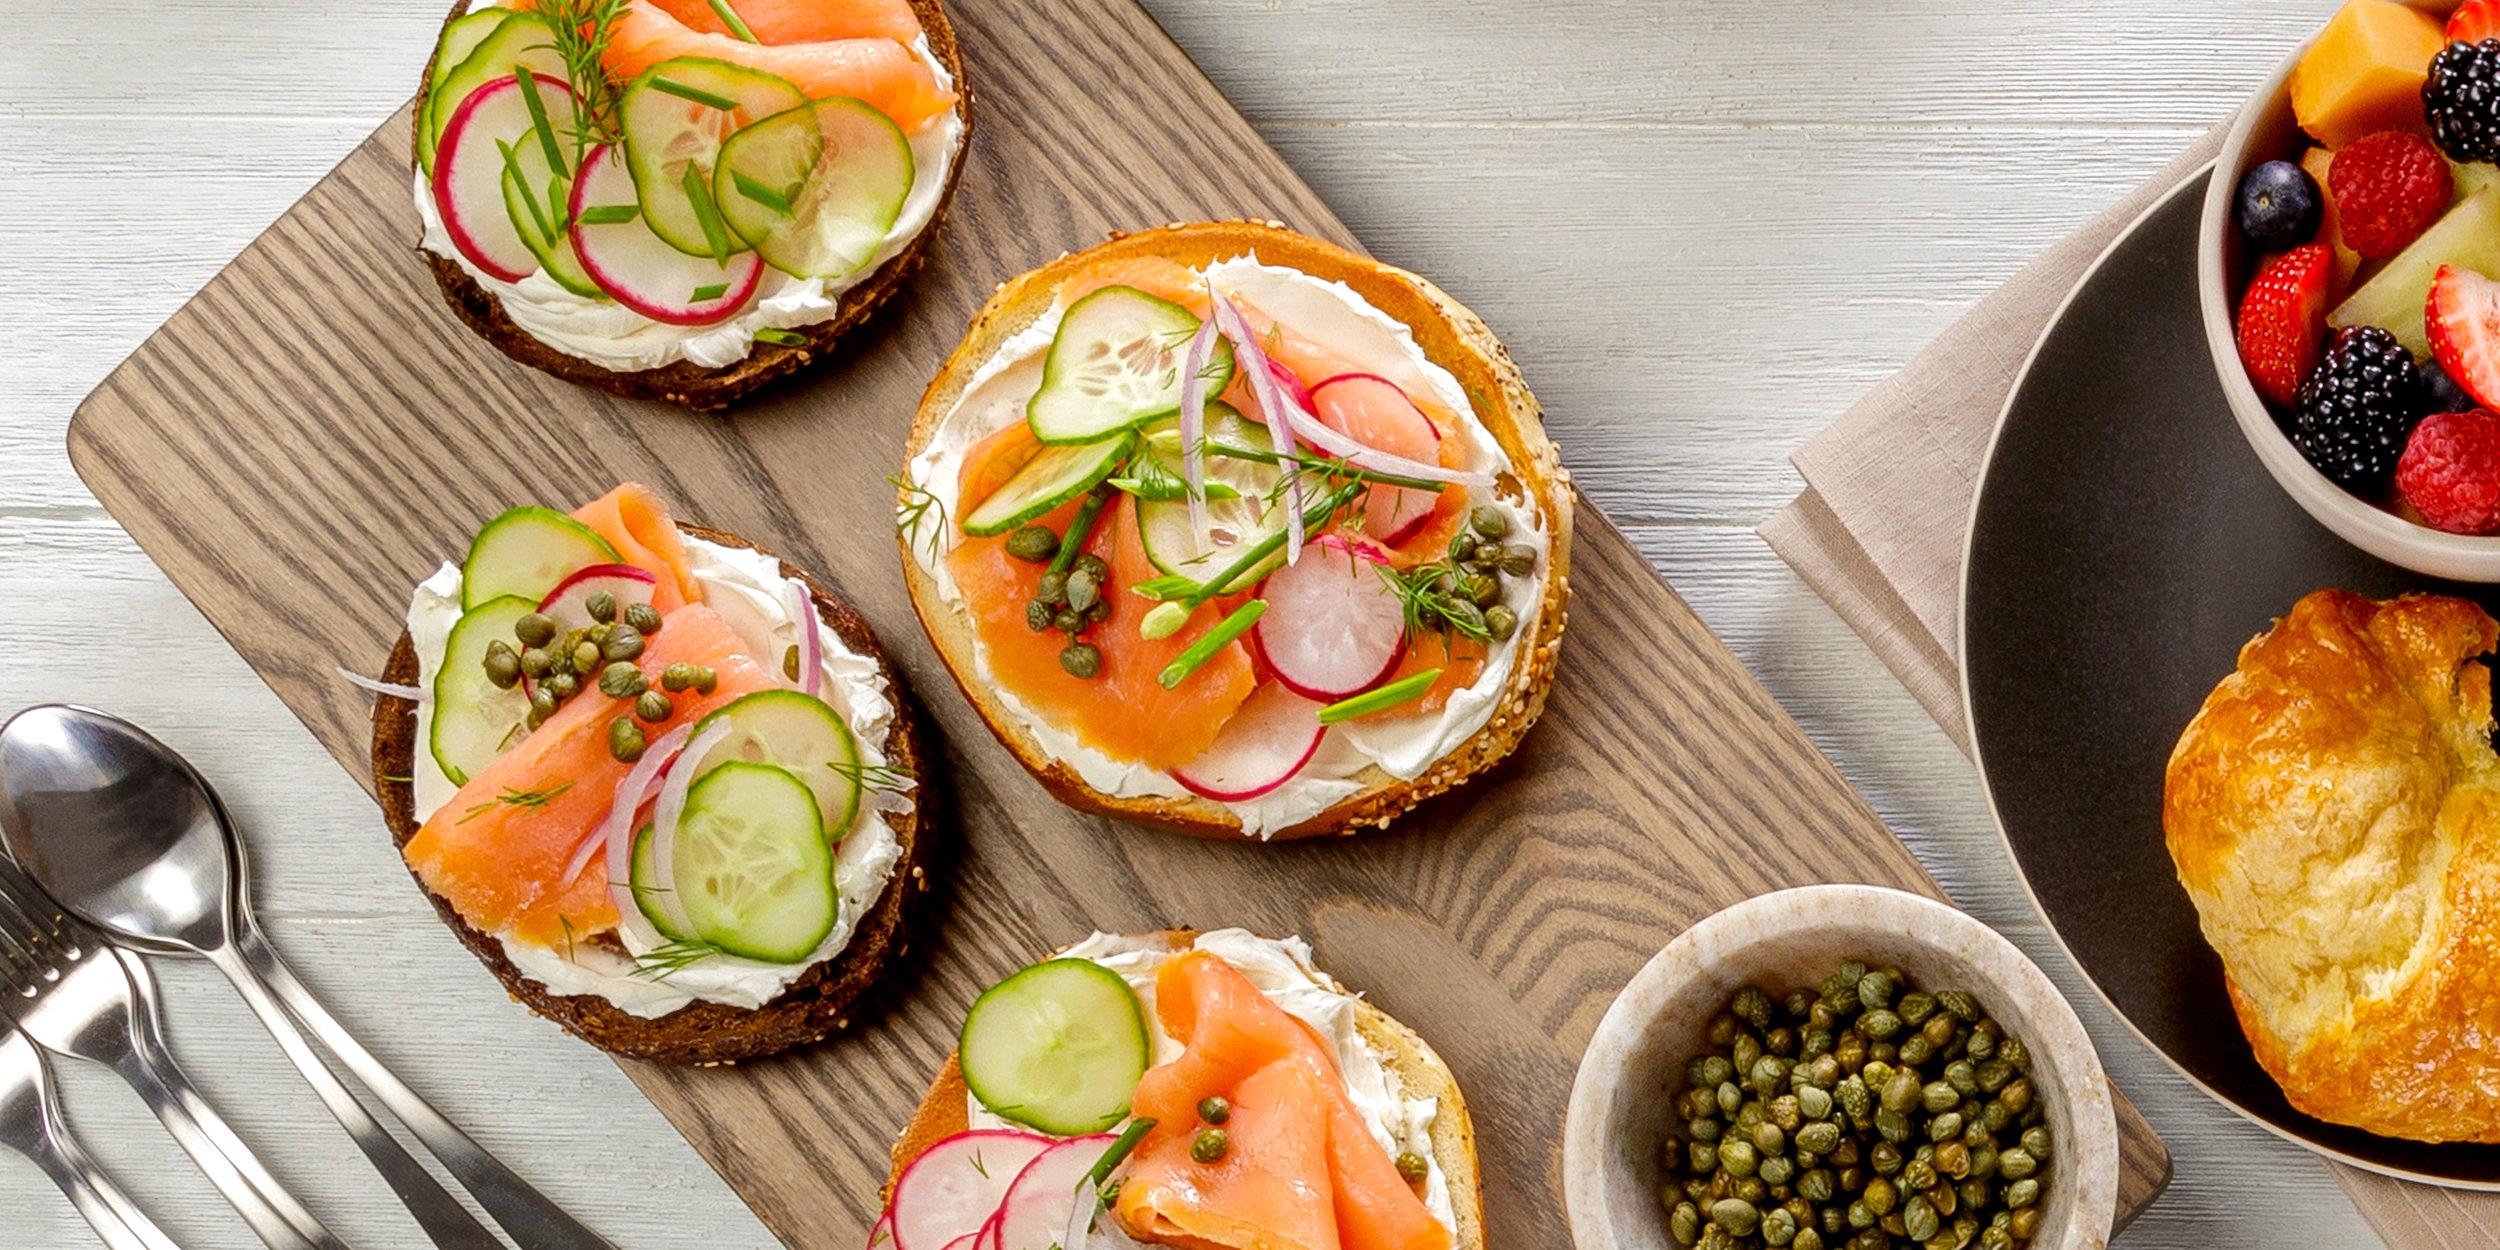 Overhead simple food spread - Bagels, Lox and Breakfast